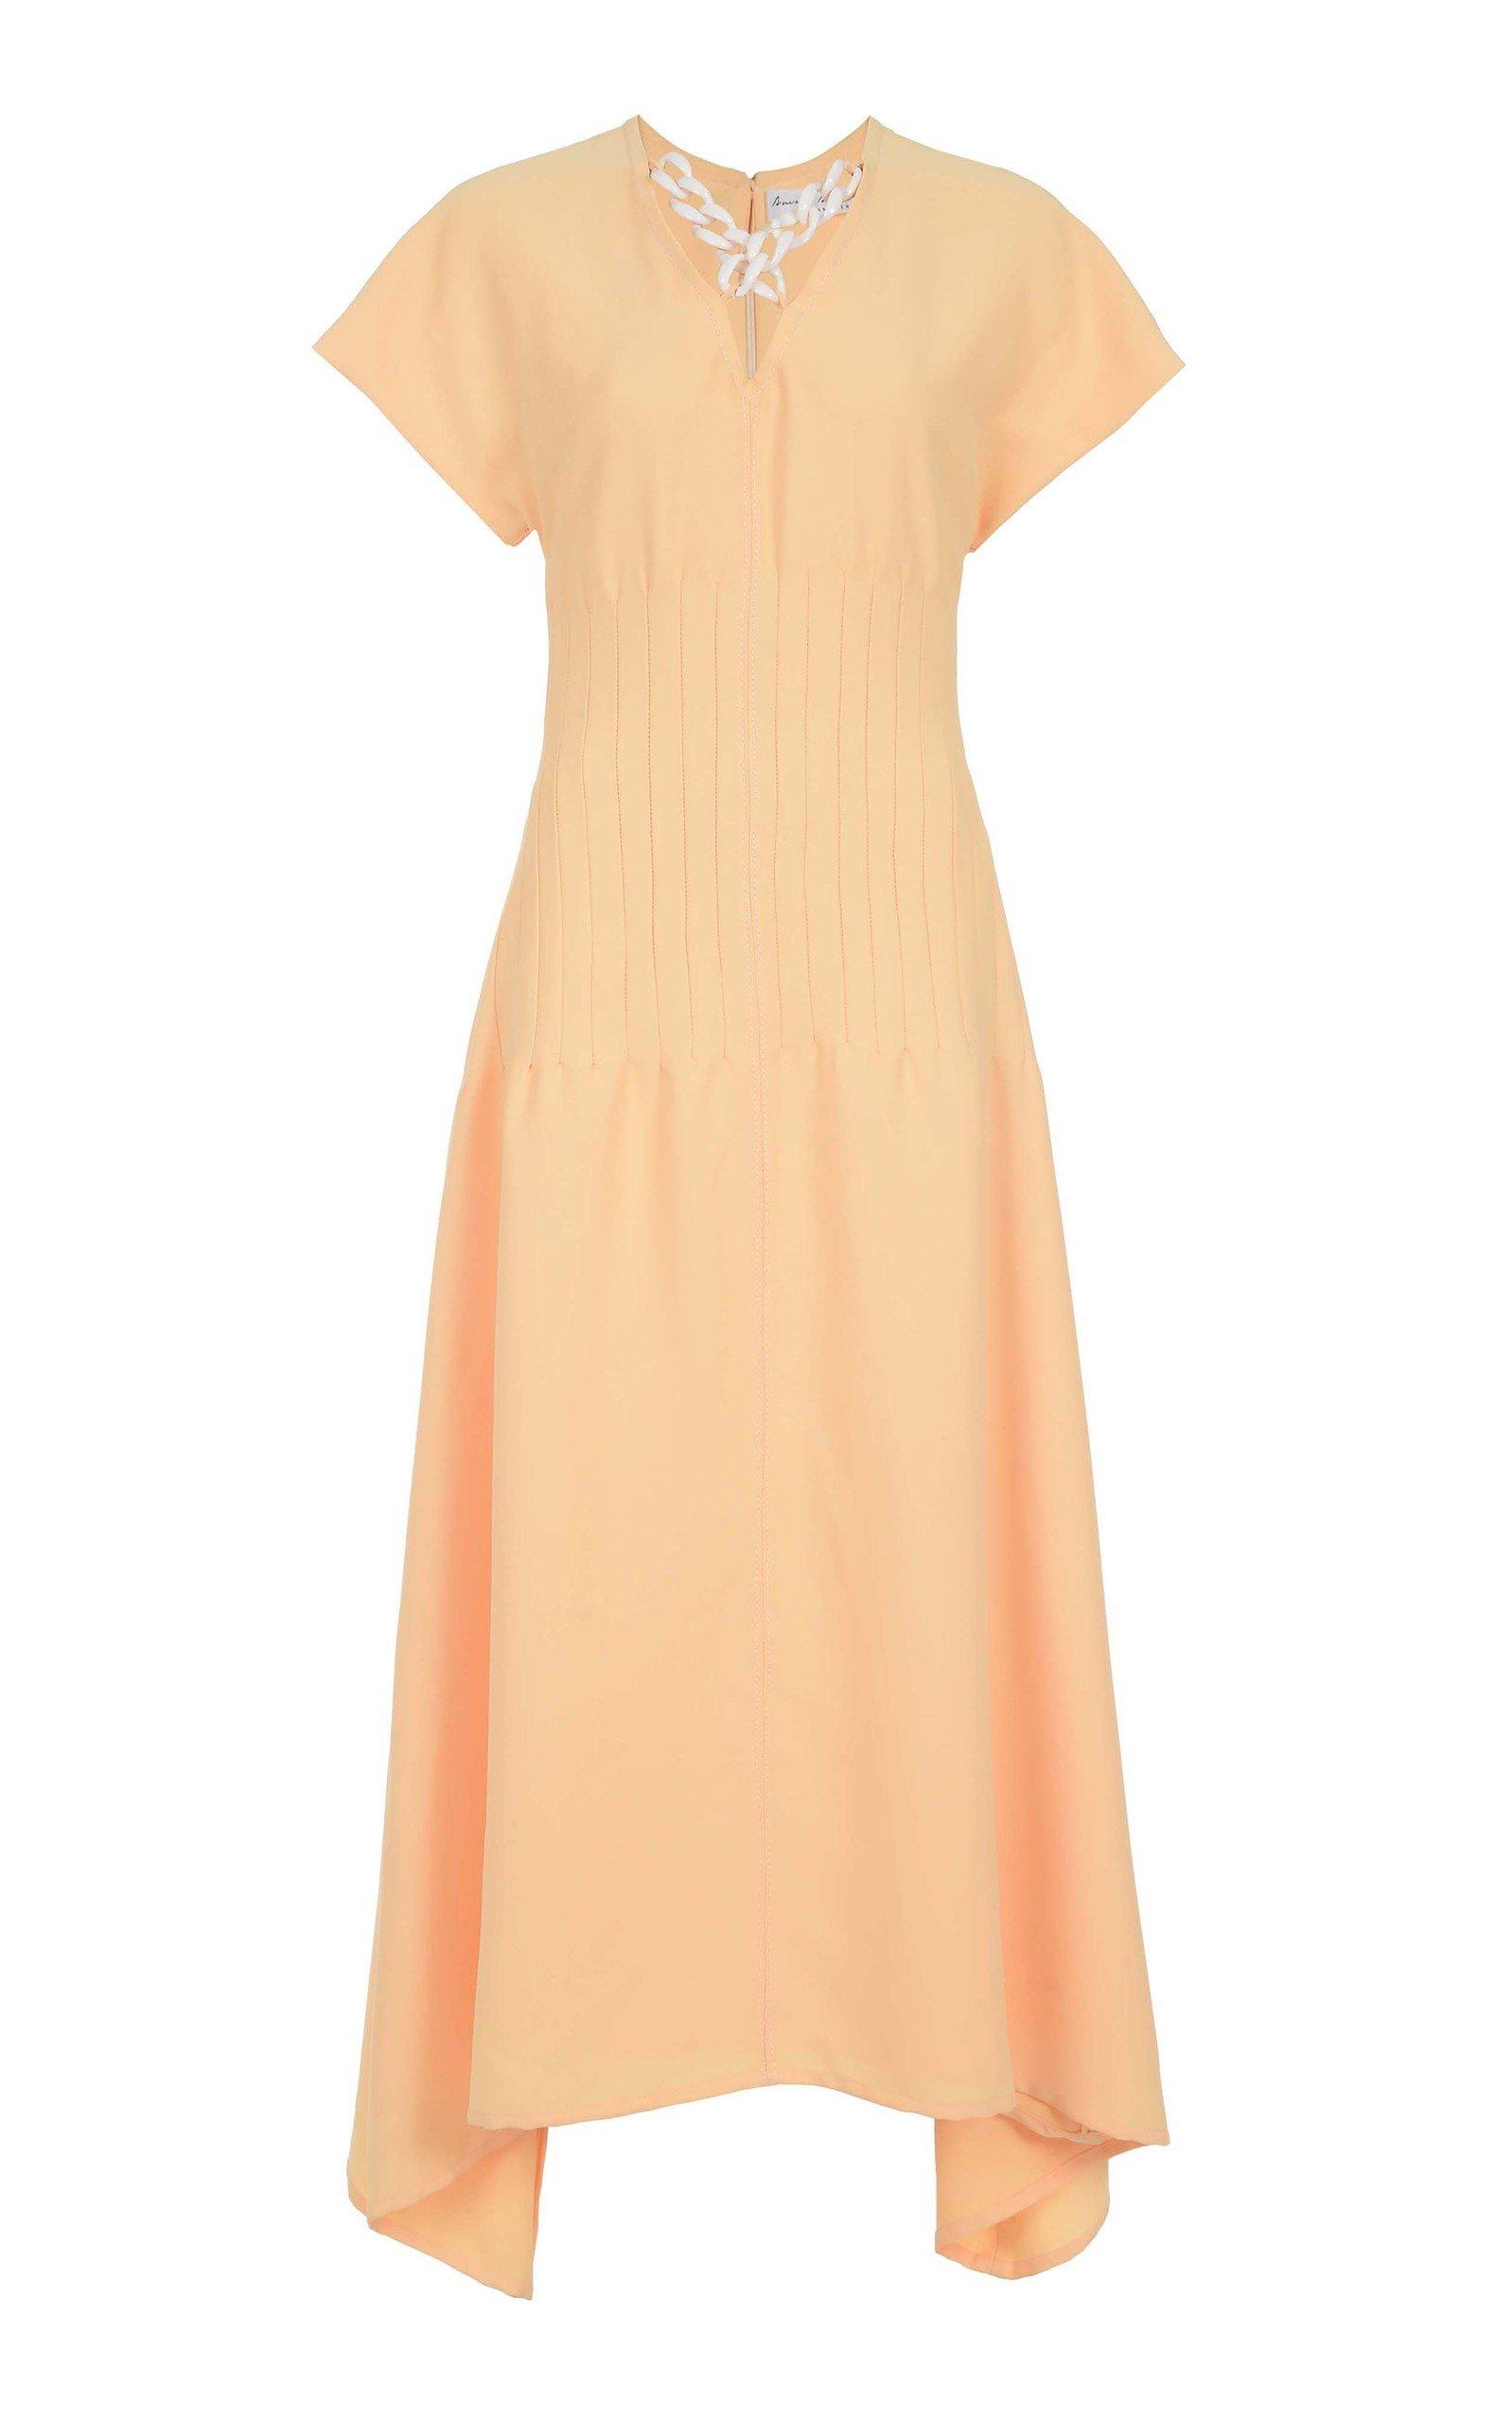 AMAL AL MULLA Cinched Crepe Midi Dress in Yellow